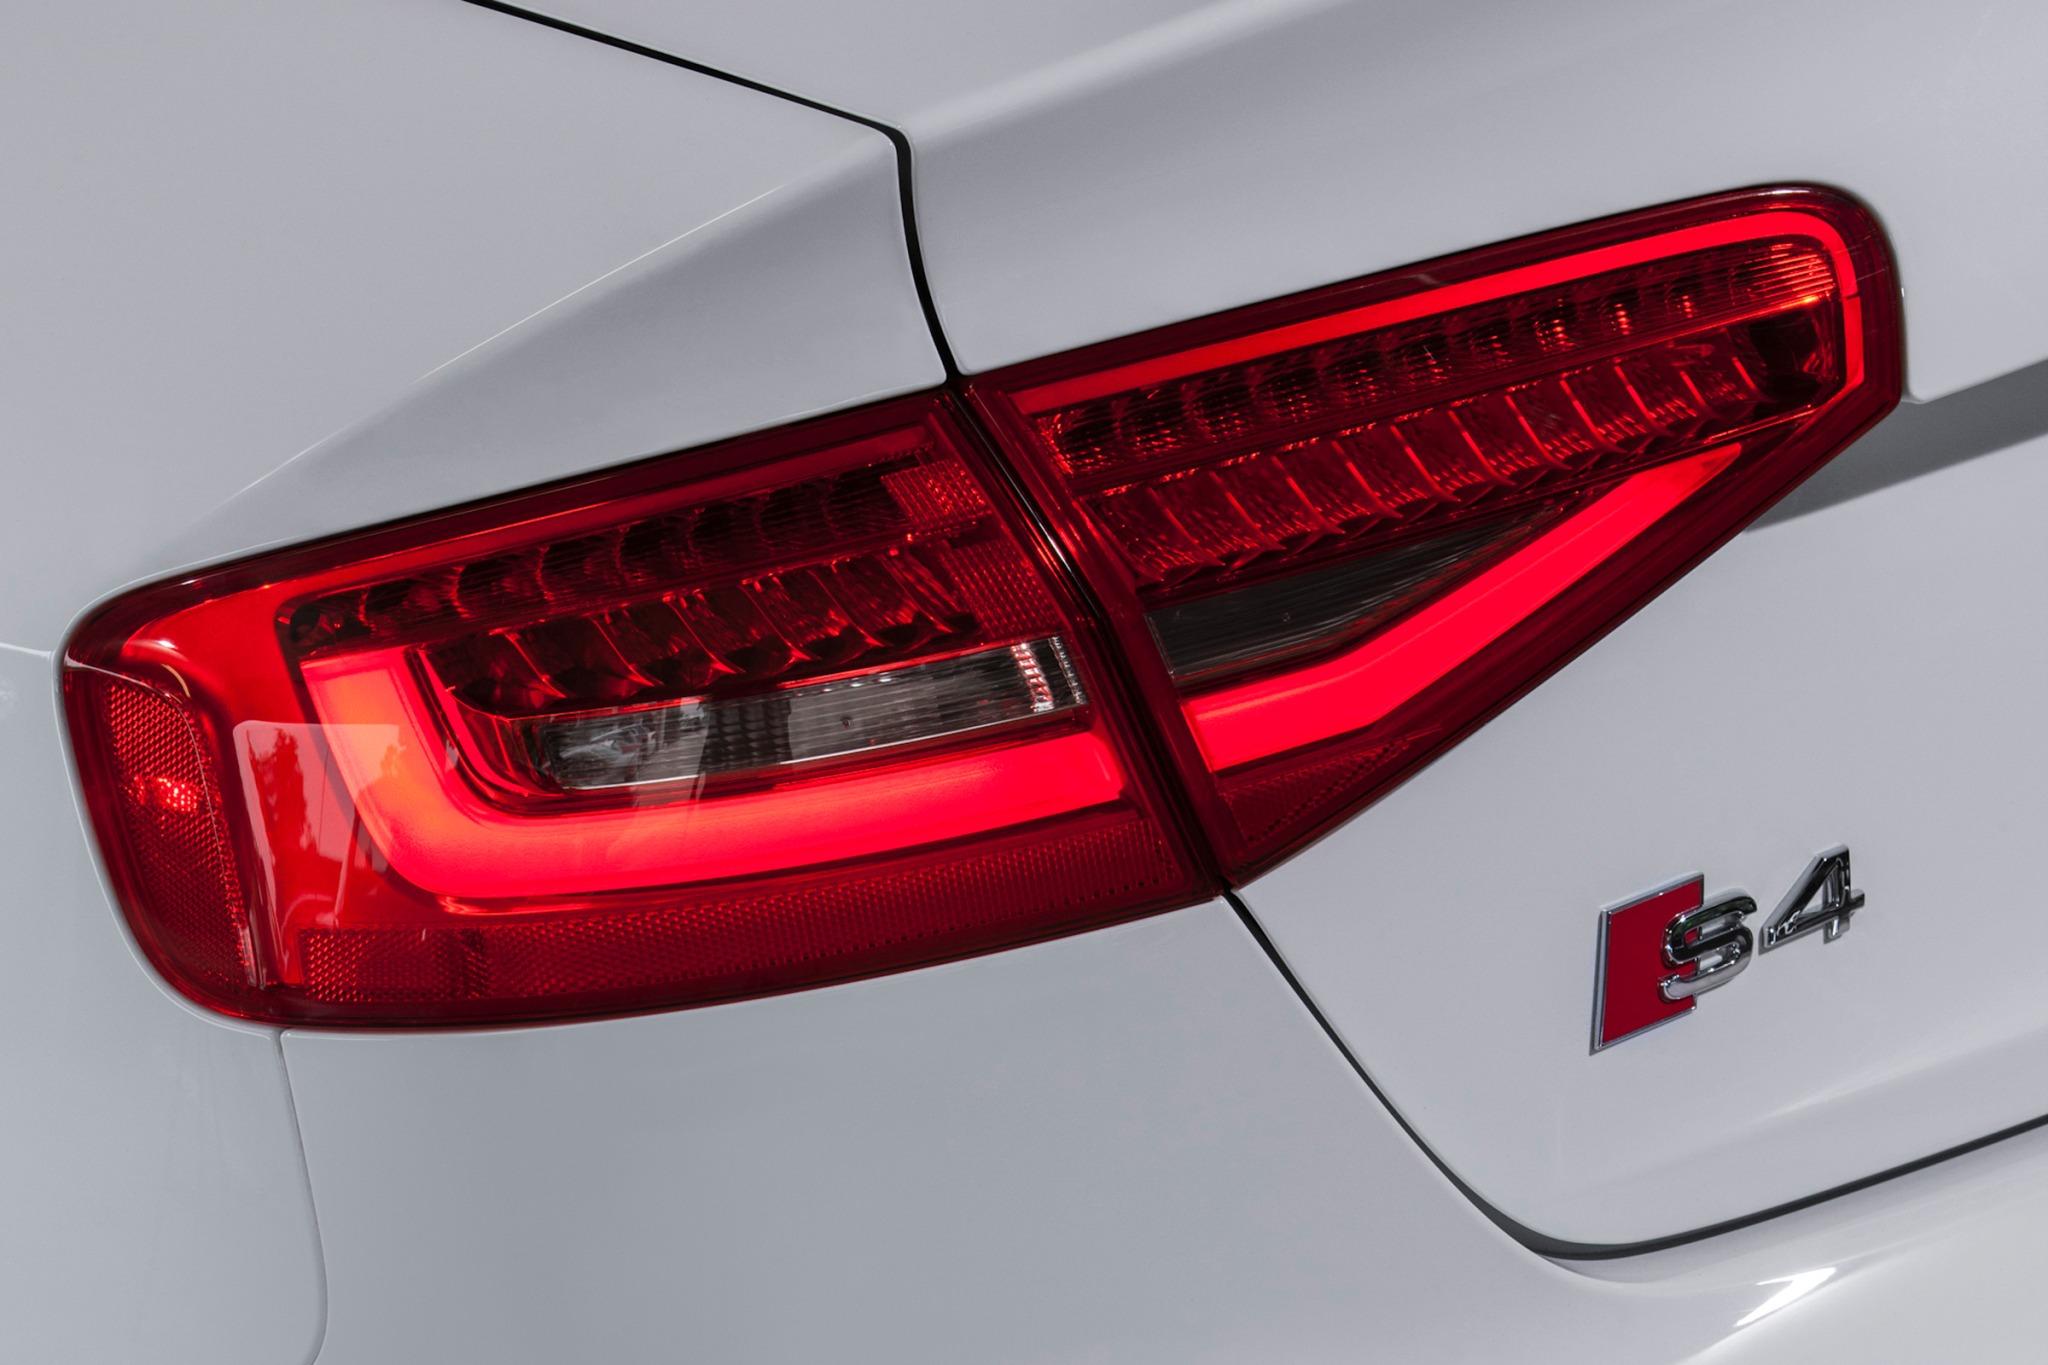 2013 Audi S4 Image 6